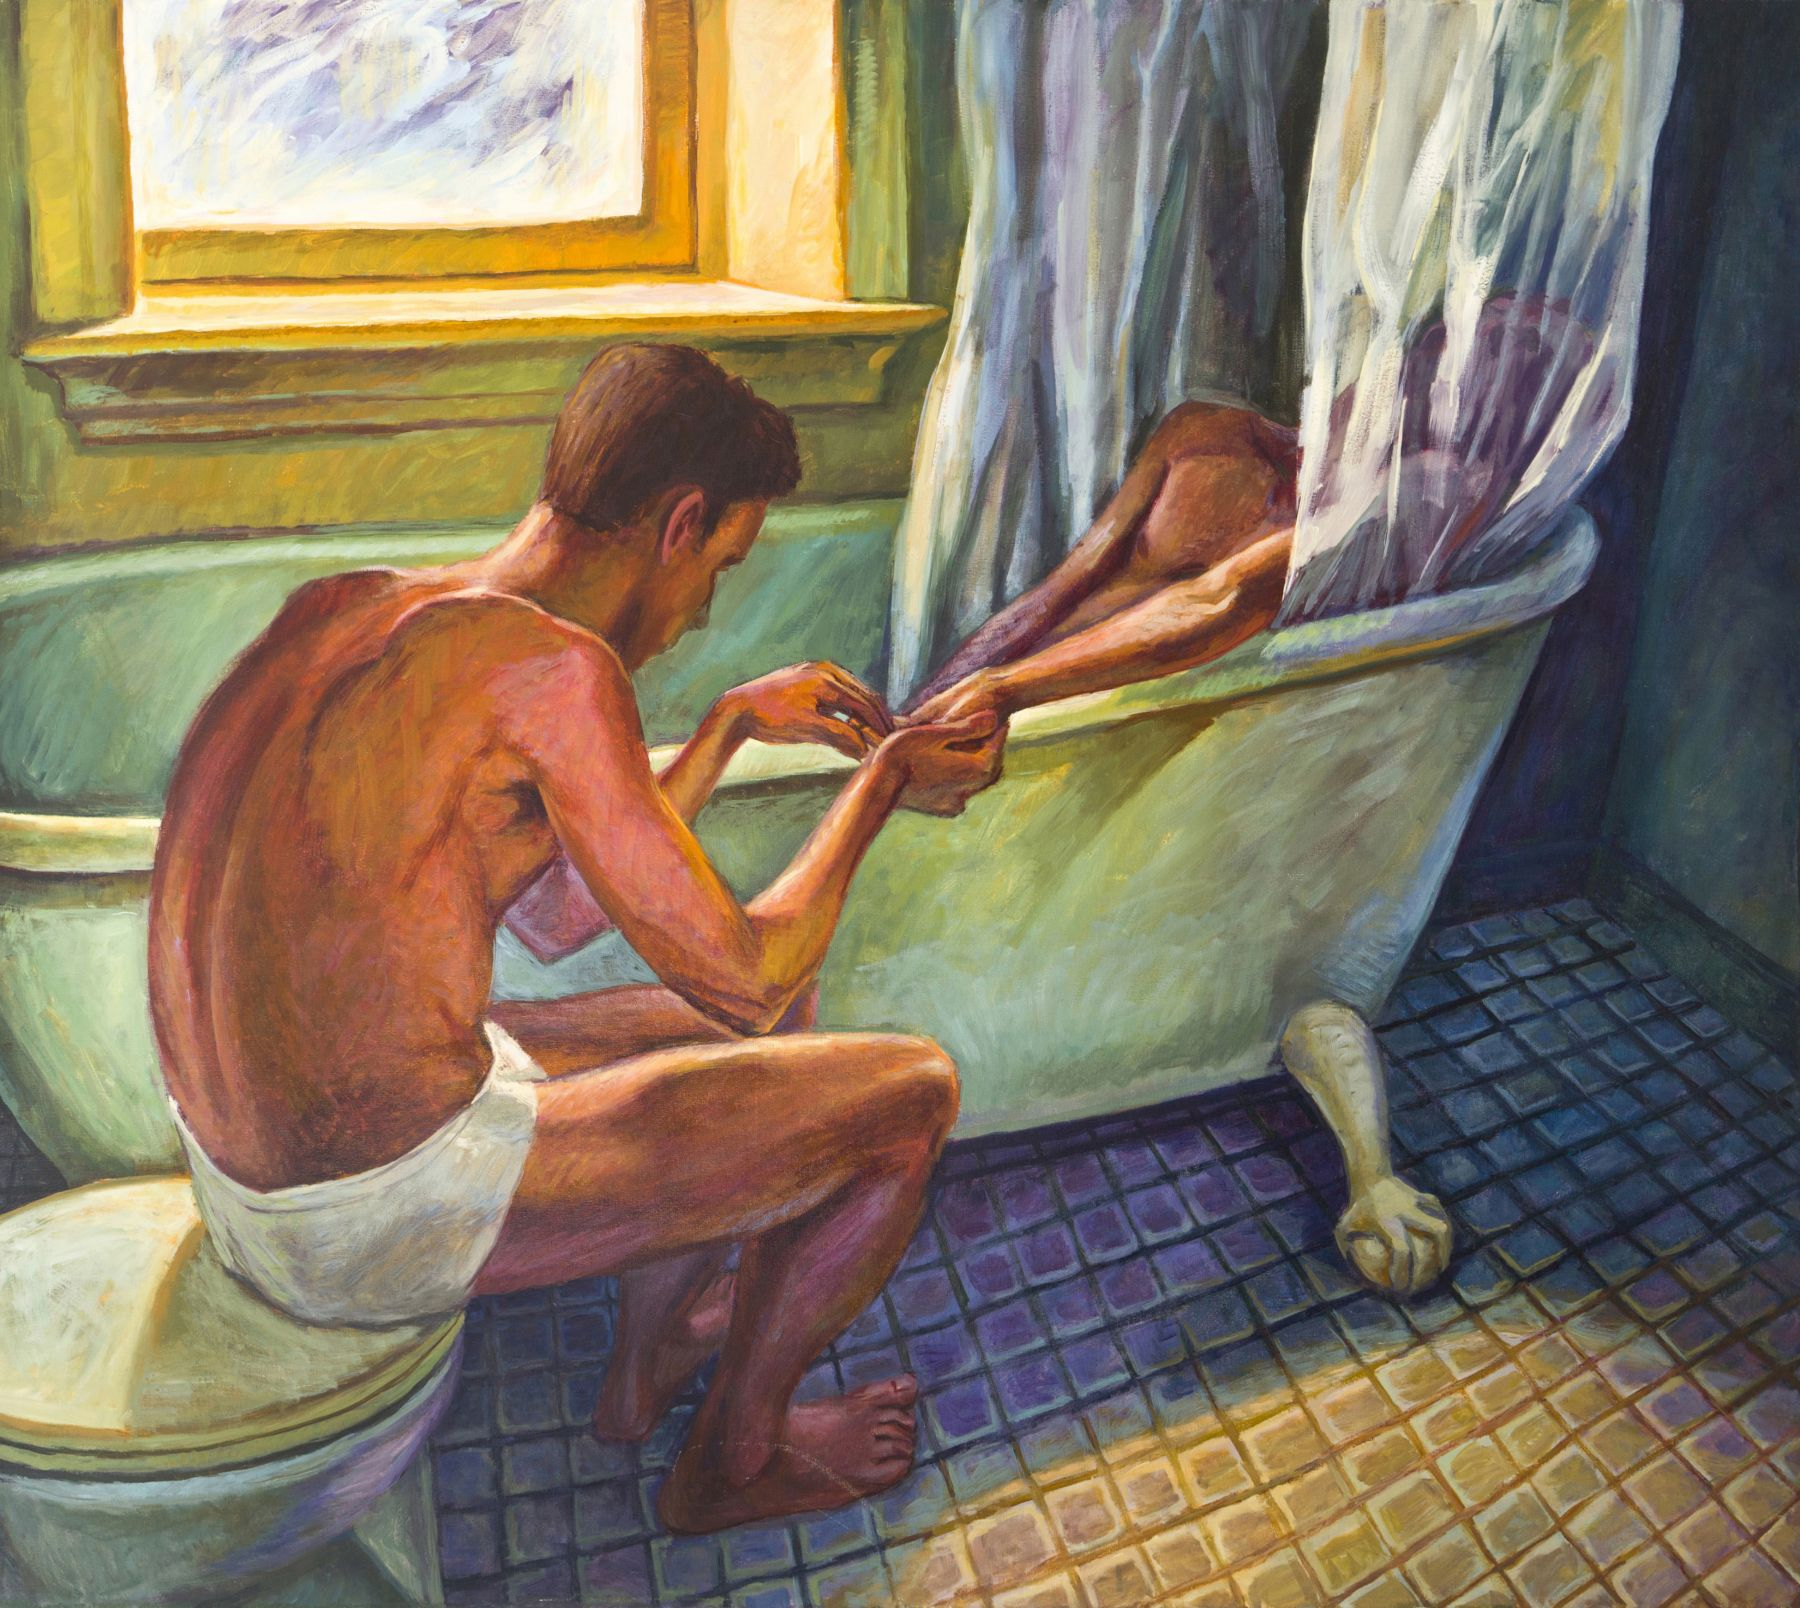 Bath Curtain (1992)